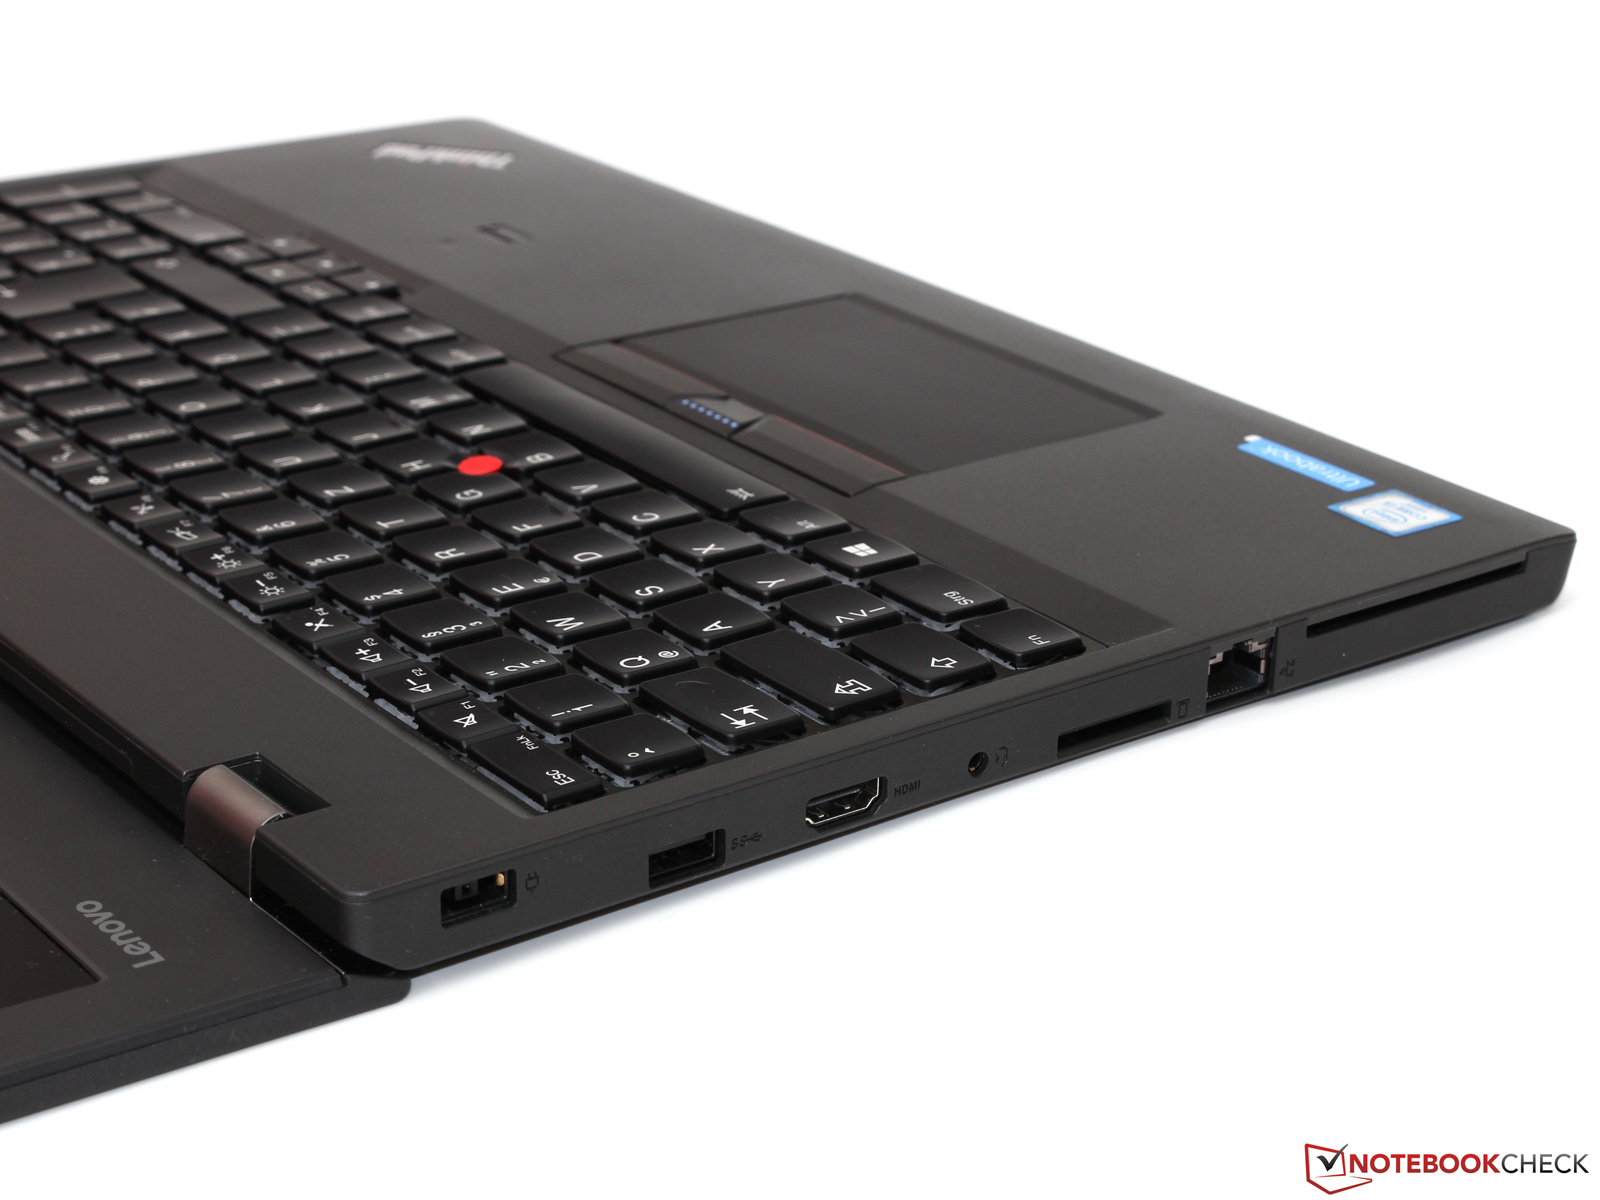 lenovo thinkpad t560 core i7 940mx 3k notebook review reviews. Black Bedroom Furniture Sets. Home Design Ideas